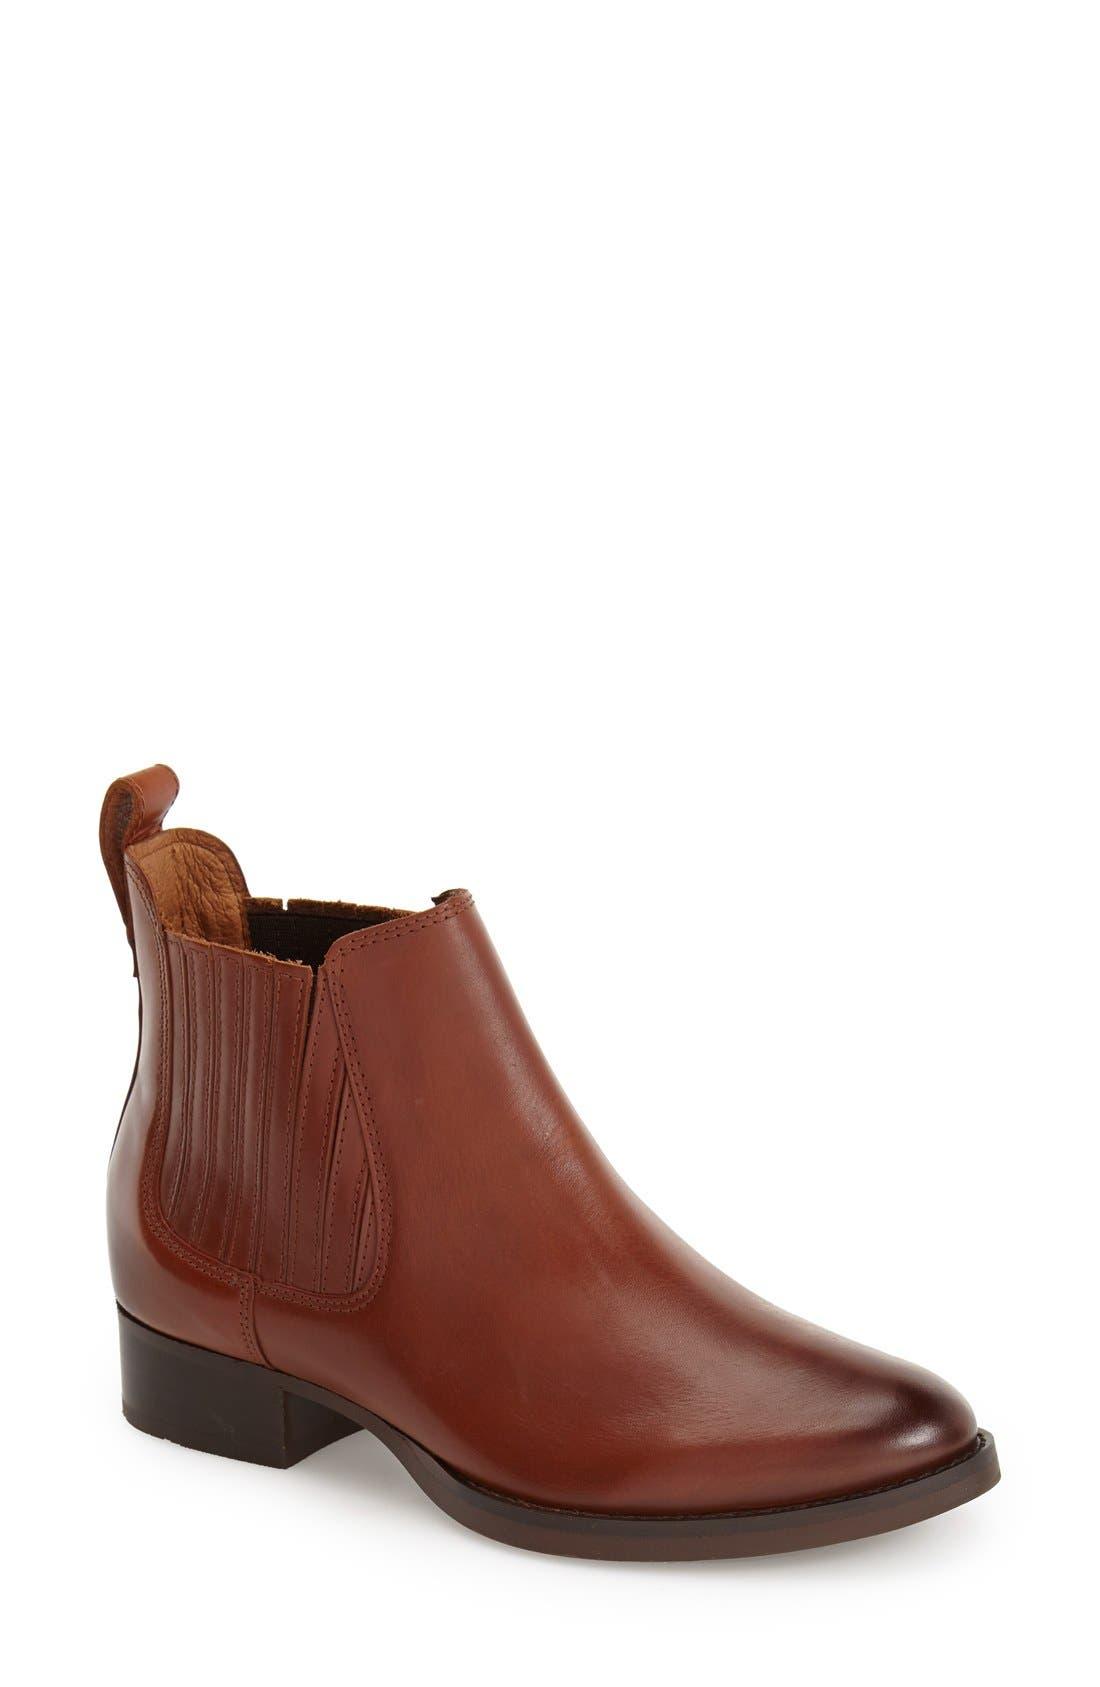 Alternate Image 1 Selected - Ariat 'Weekend' Boot (Women)